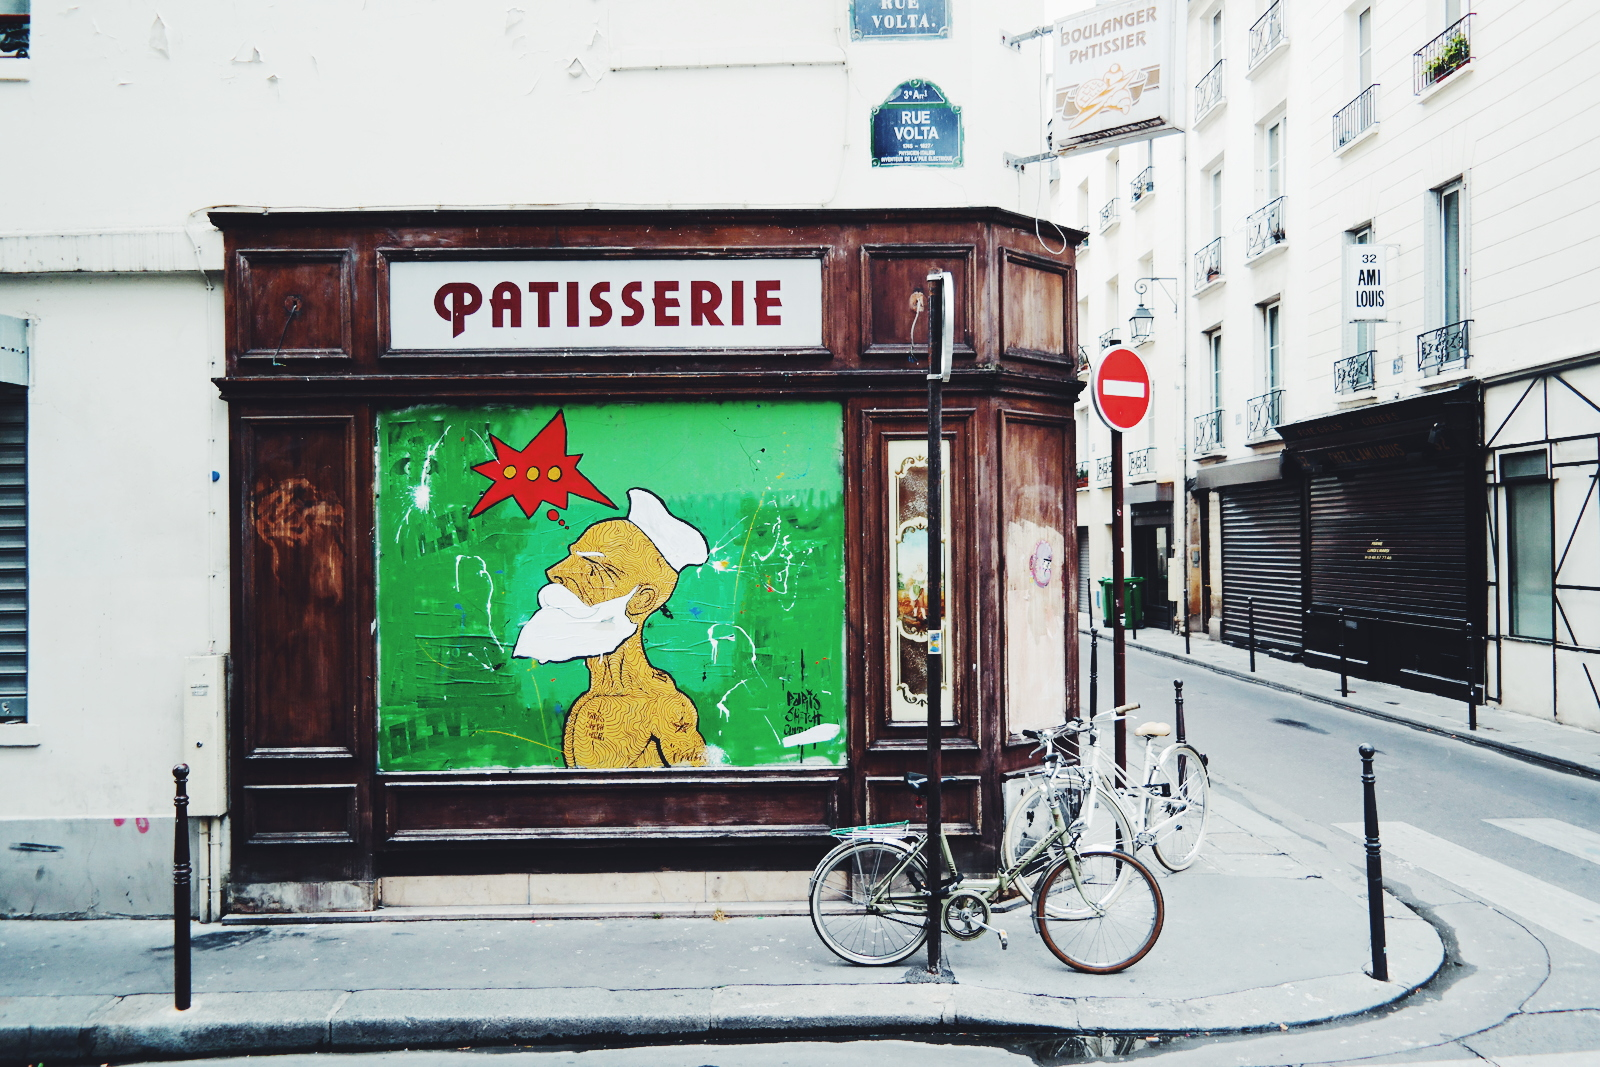 French-sailor-marin-barbu-et-français-by-Paris-Sketch-Culture-Raphael-Federici-Patisserie-Rue-Volta-graffiti-street-art-wall-street-photography-by-United-States-of-Paris-blog